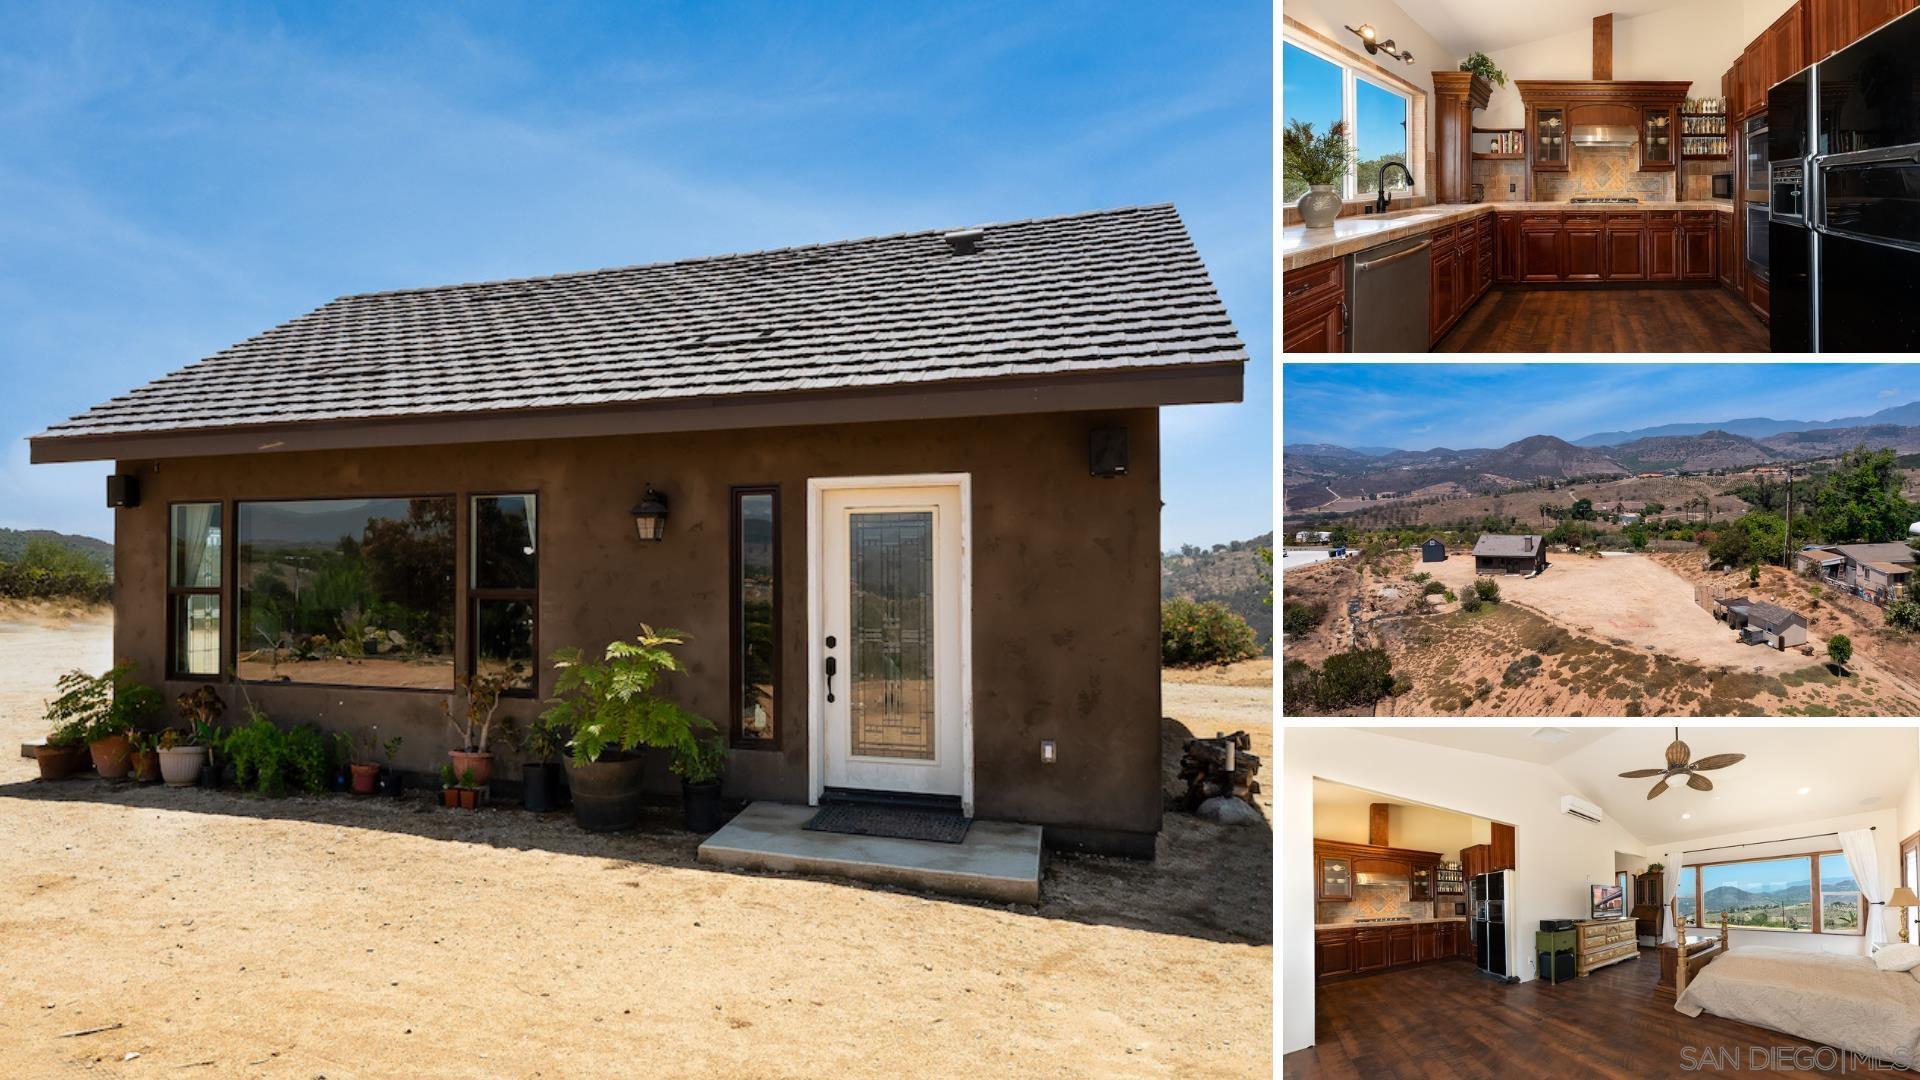 11781 Mesa Verde Dr, Valley Center, CA 92082